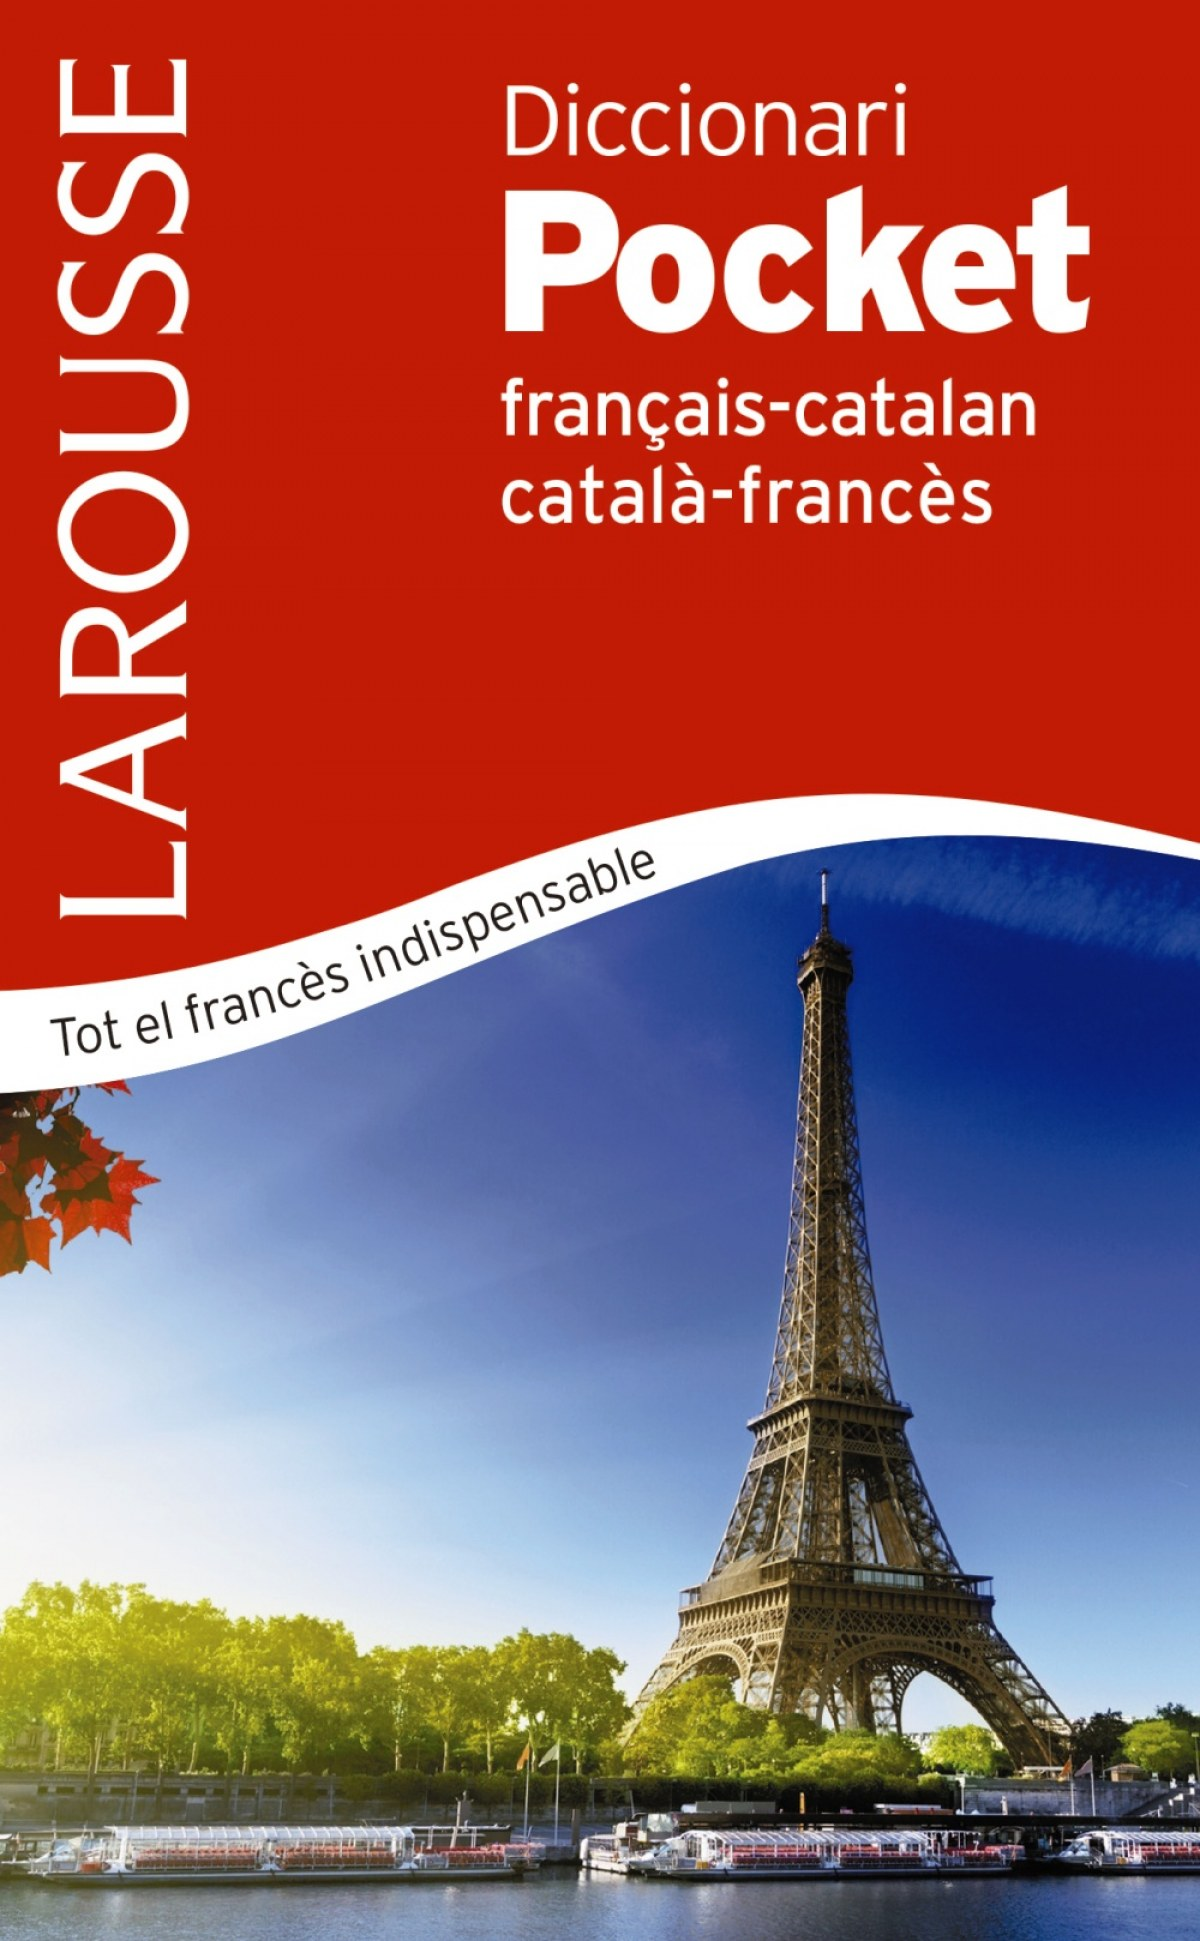 DICCIONARIO POCKET CATALÁ-FRANÉS/FRANçAIS -CATALÁN 9788417720254